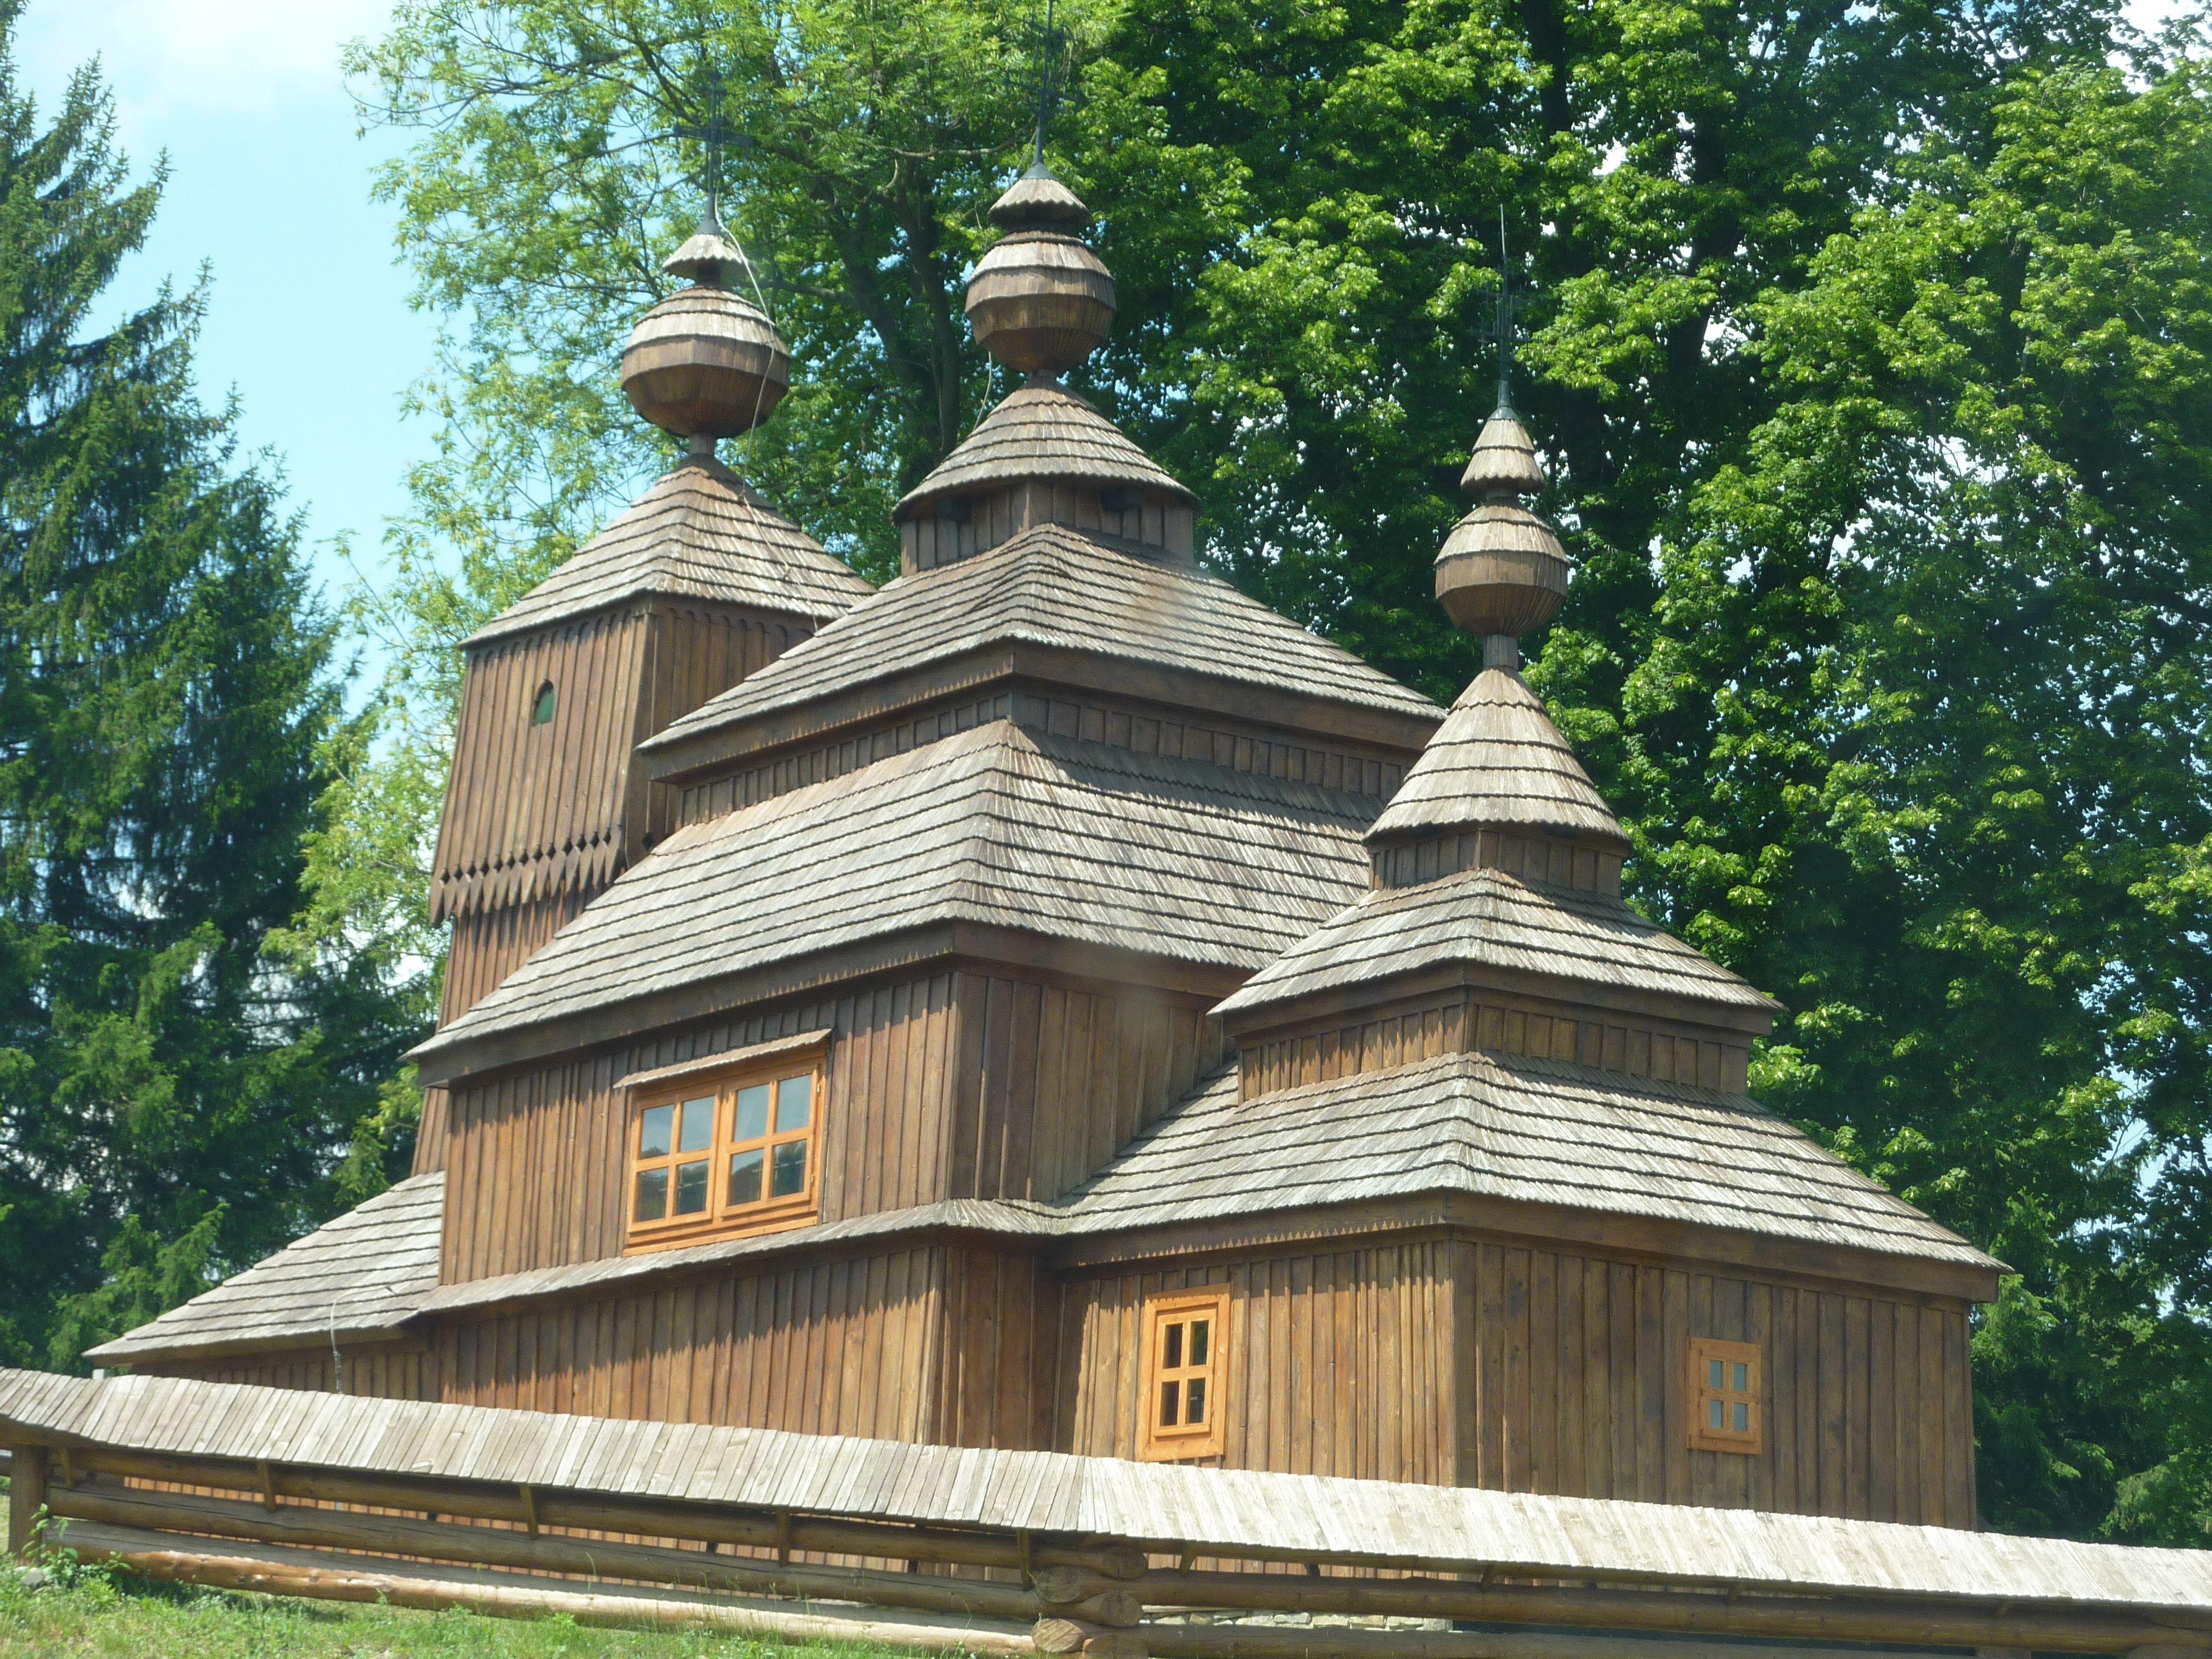 Bodruzal wooden church - June 2014